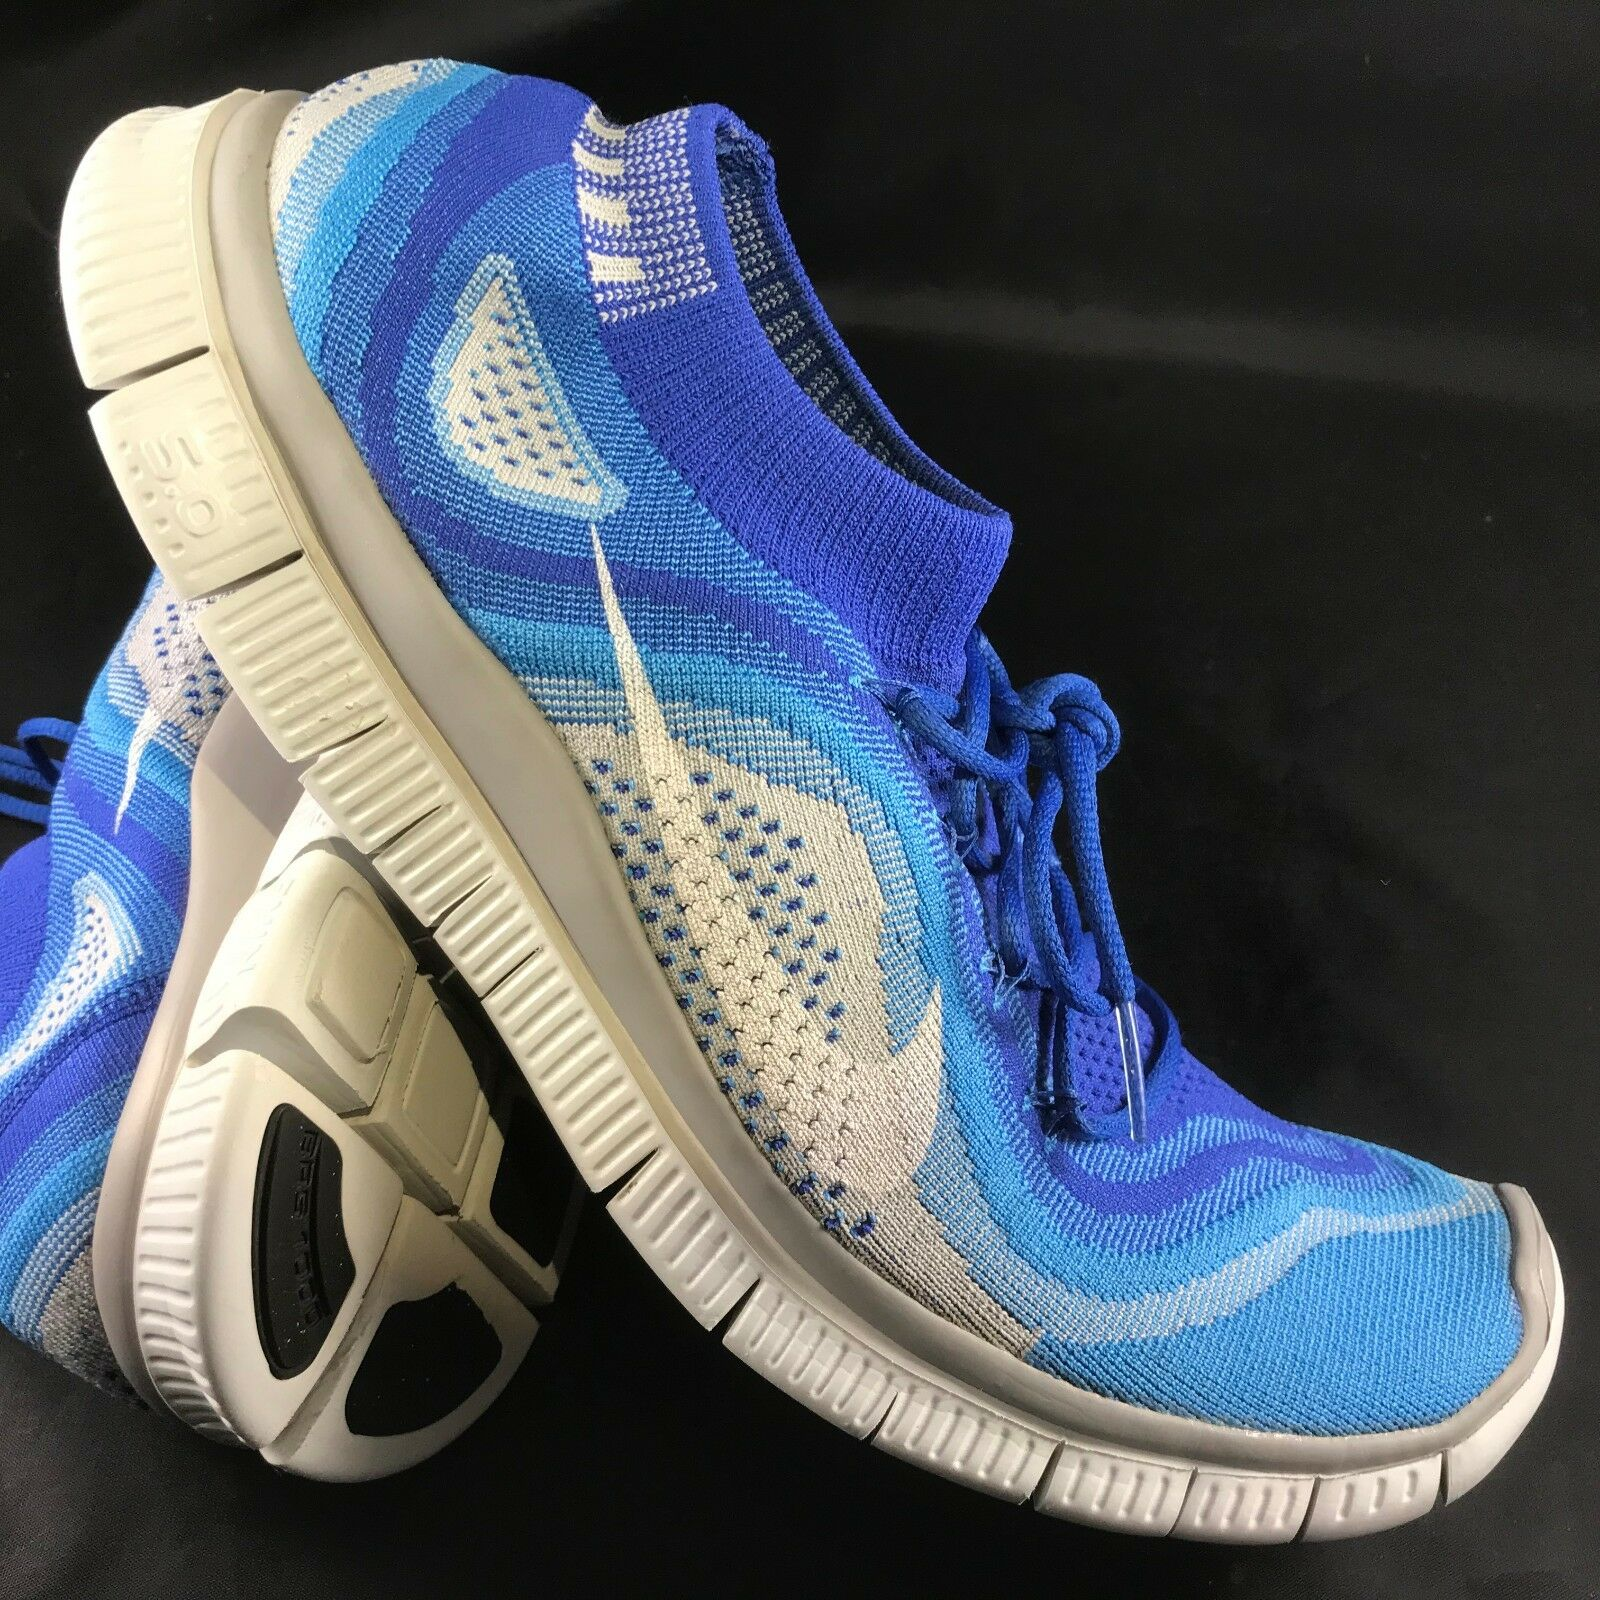 NIKE FREE 5.0 FLYKNIT 615805-414 Men's Athletic Sneakers Size 13 bluee White Grey